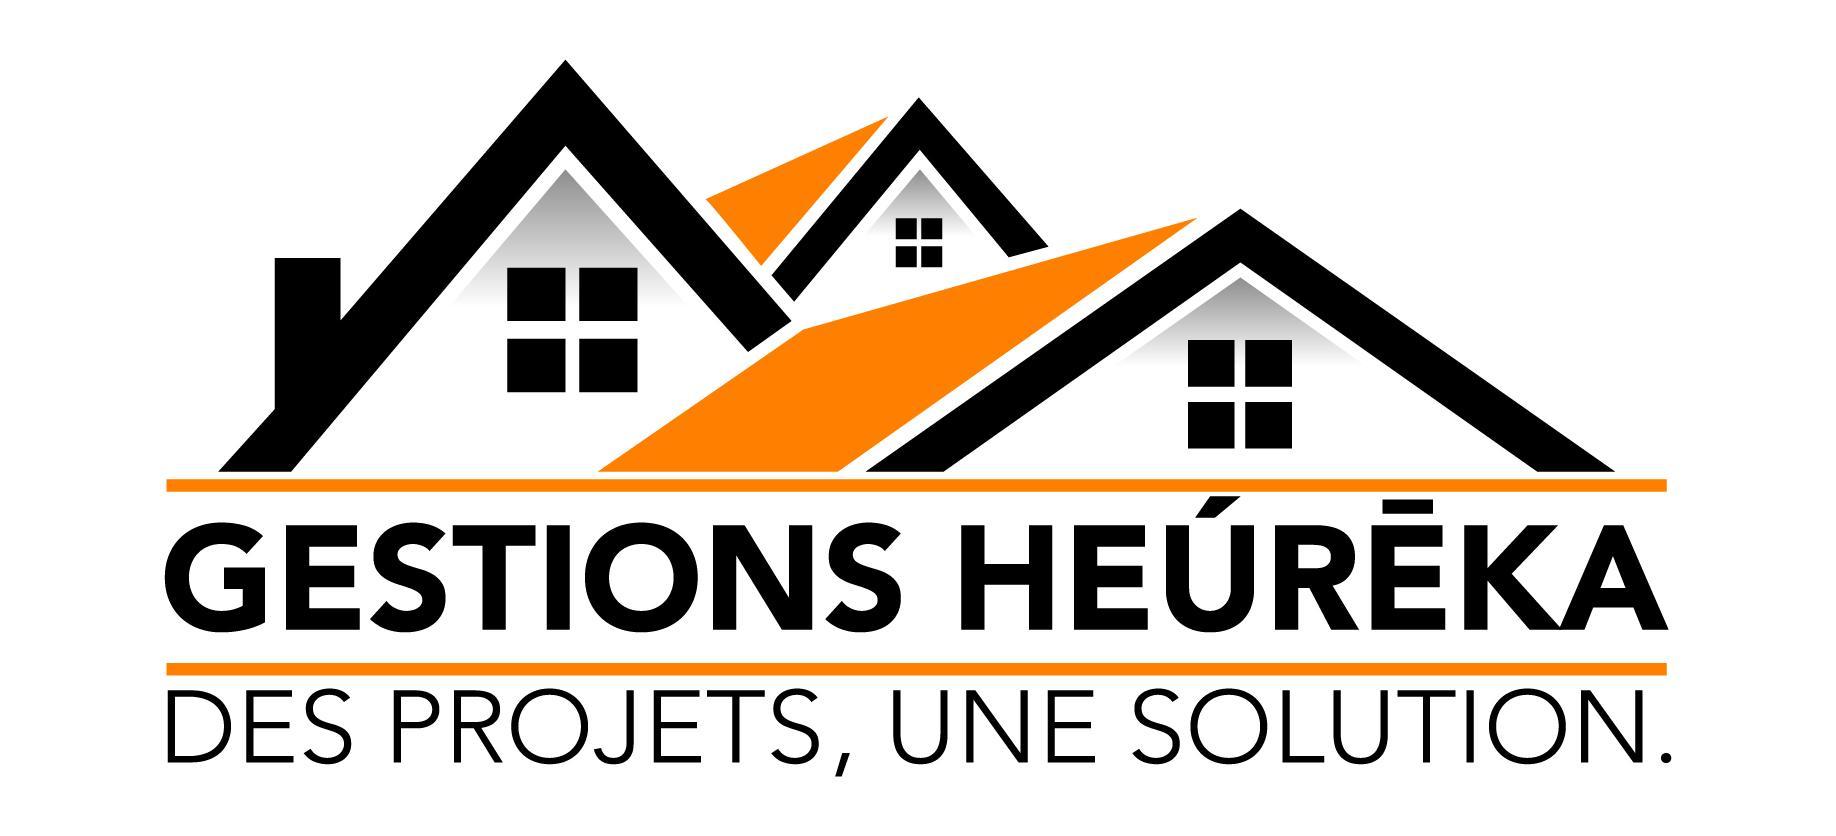 Rénovation Les Gestions Heureka